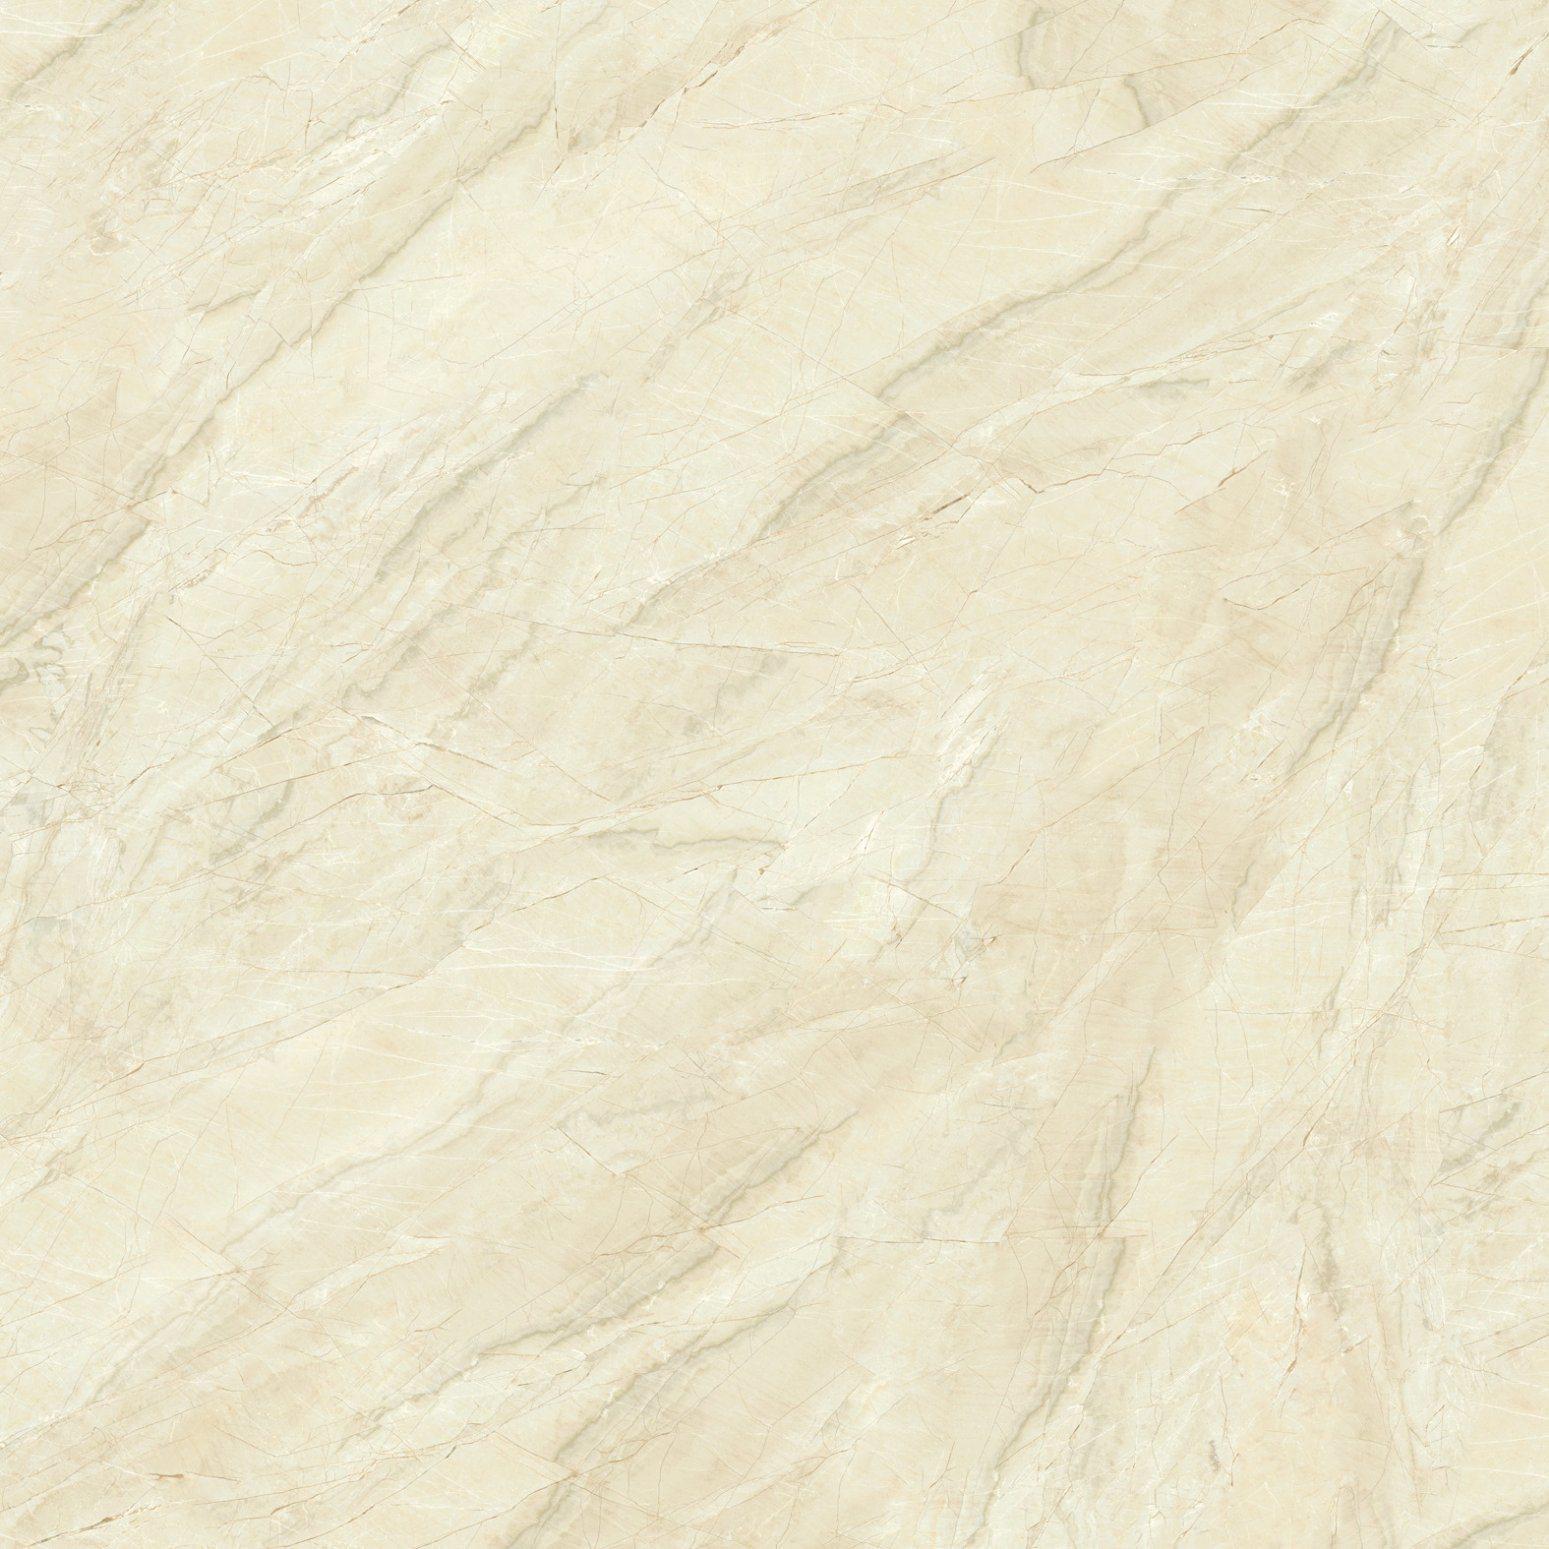 China Building Material Ceramic Tiles Marble Glazed Floor Tile